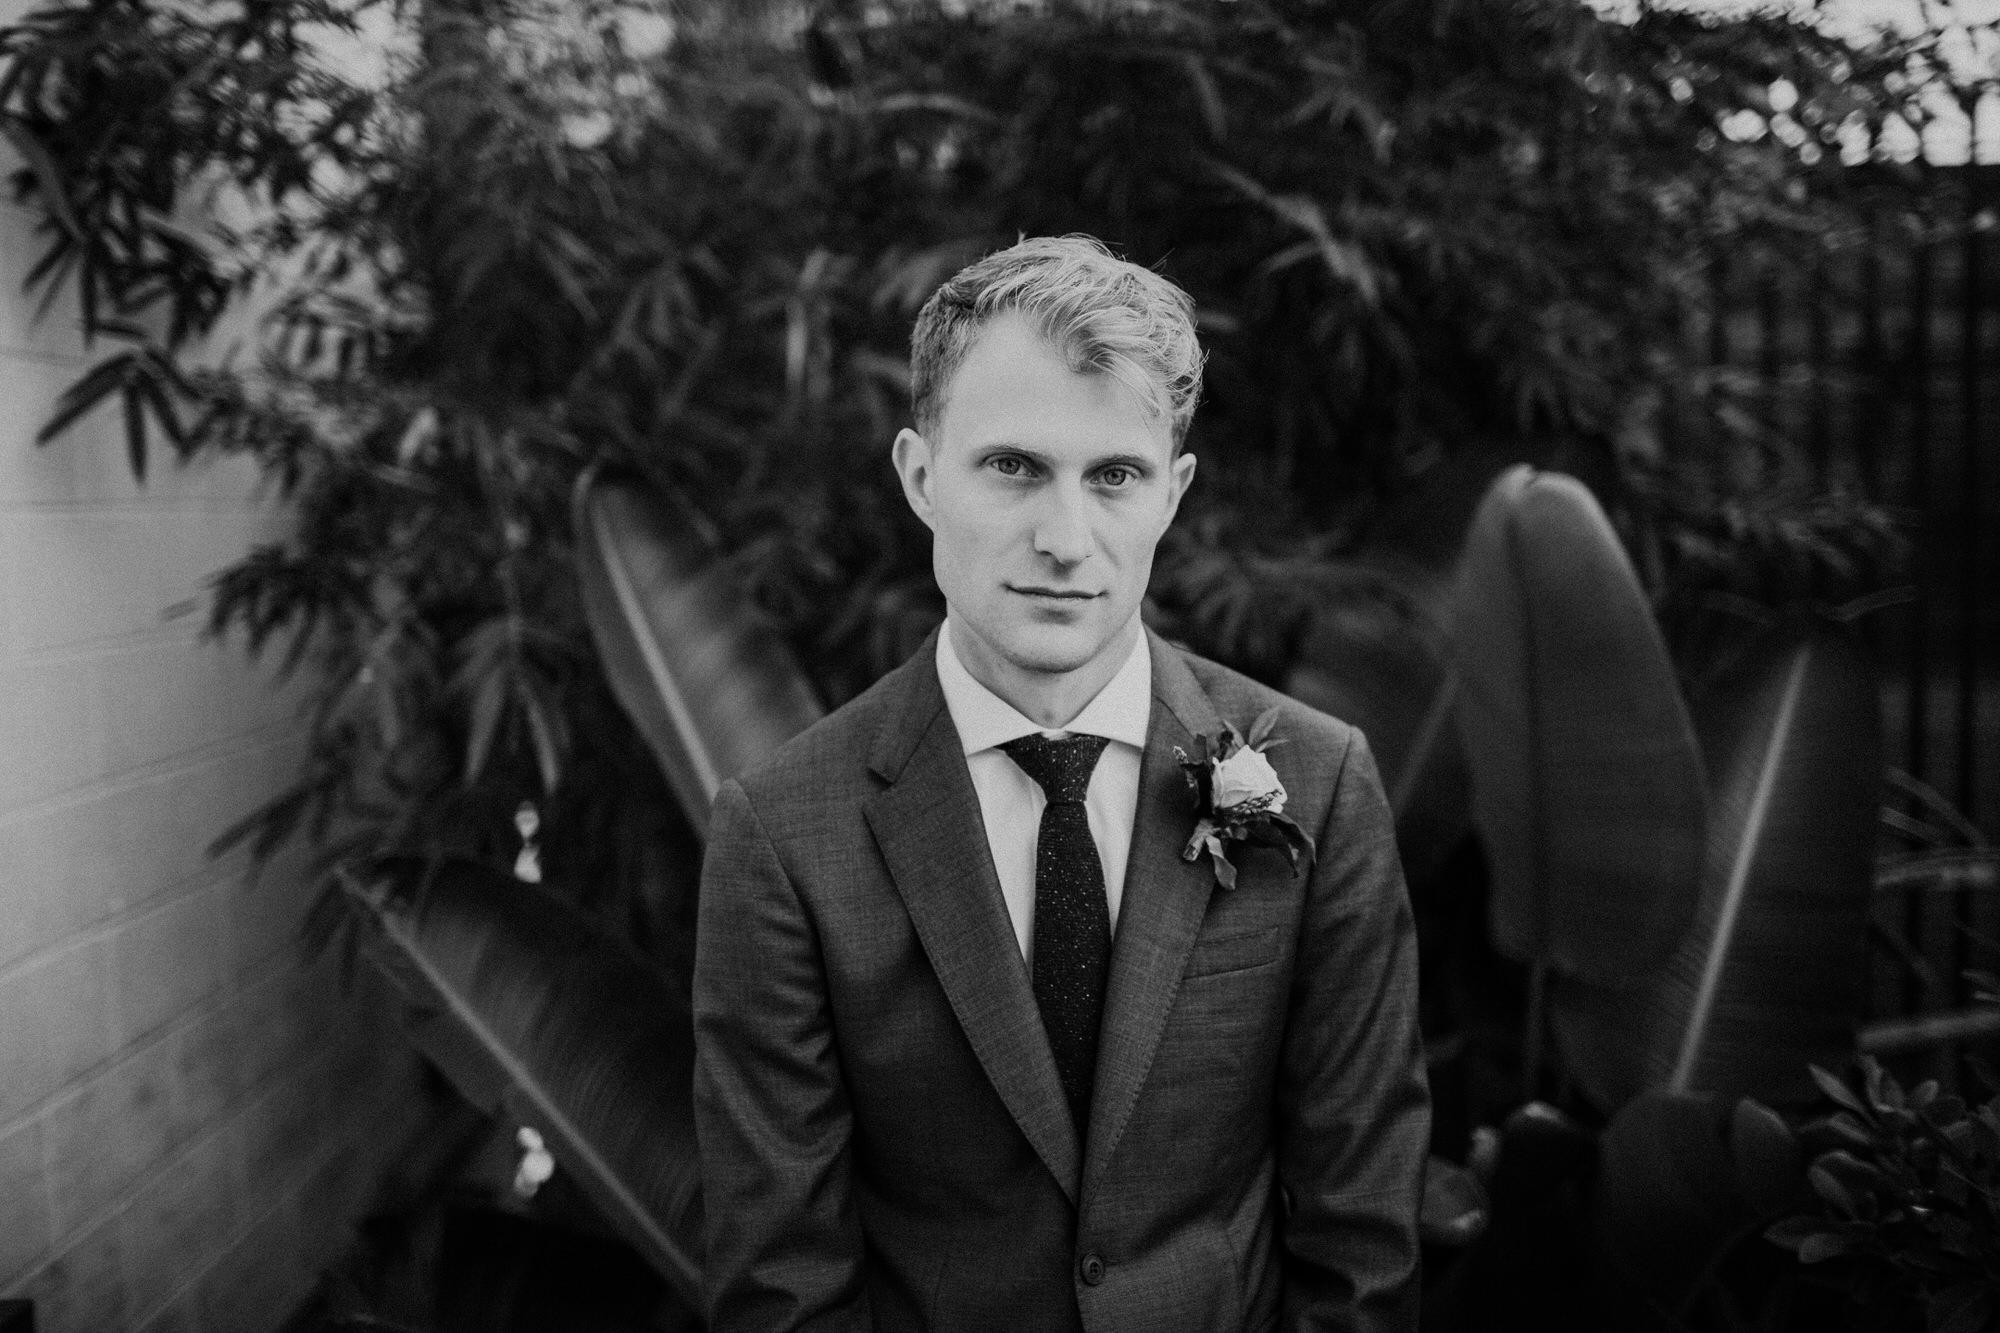 los-angeles-wedding-photographer-millwick-76.jpg